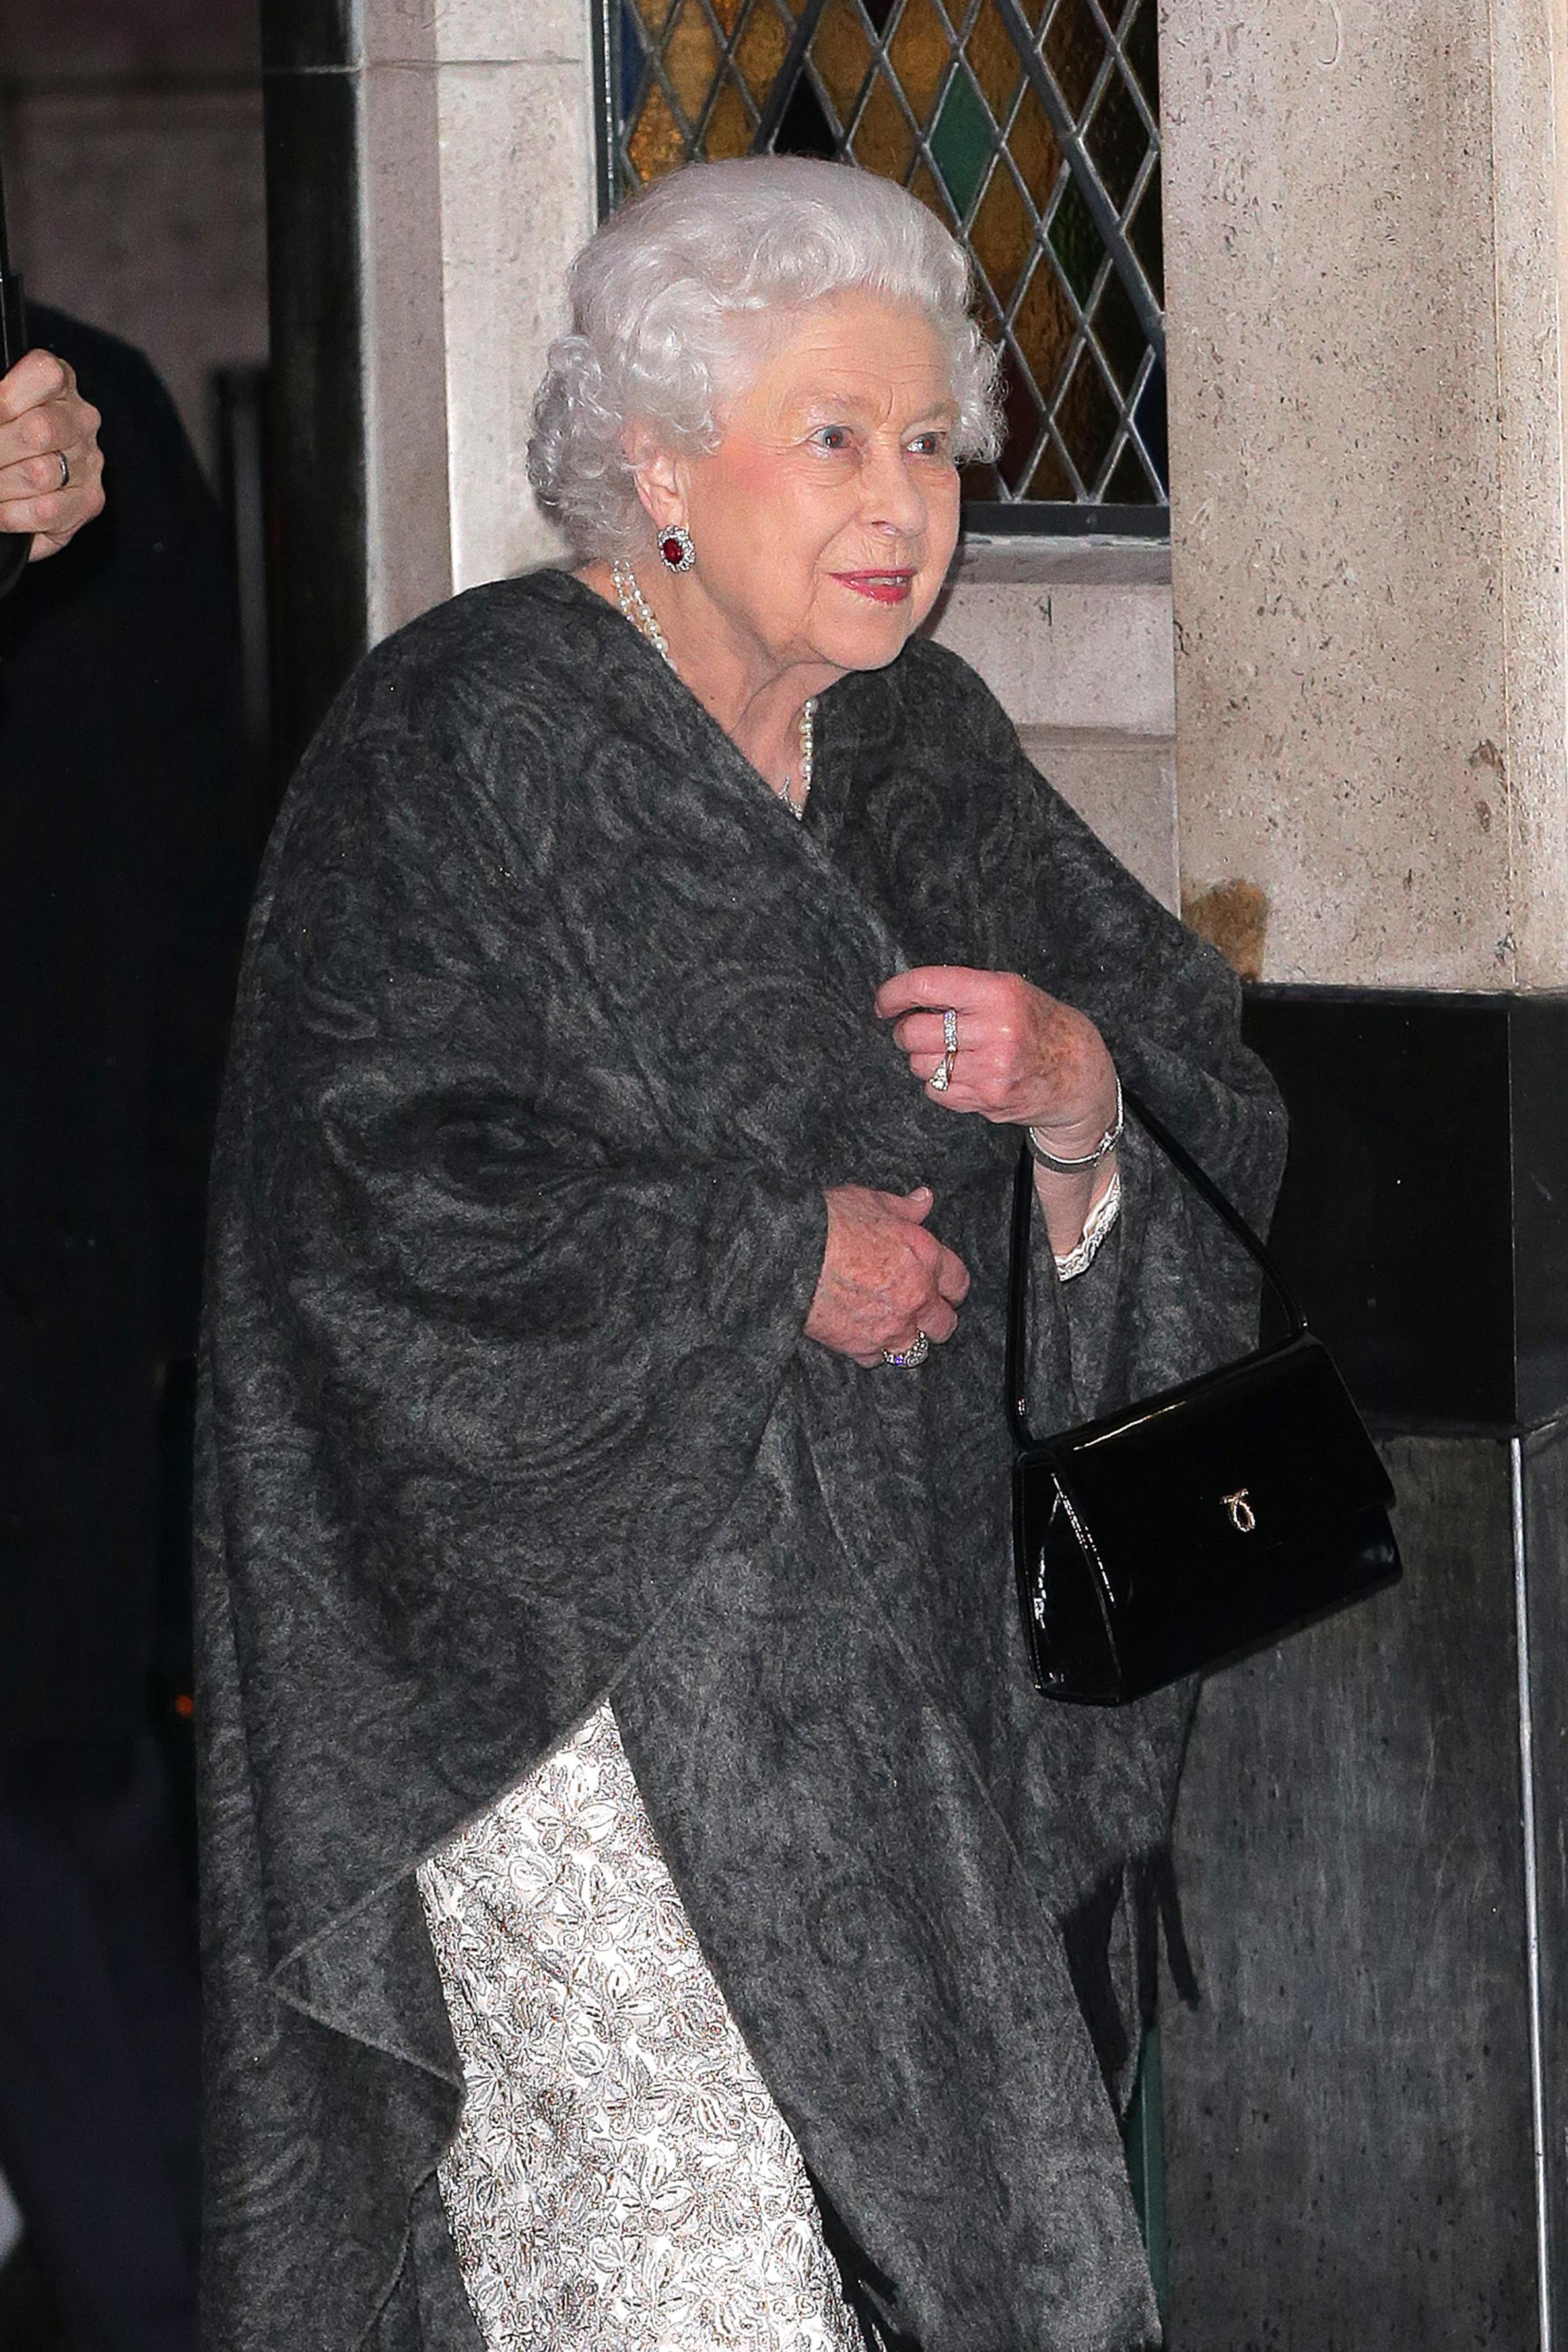 Queen Elizabeth The Ivy Smiling